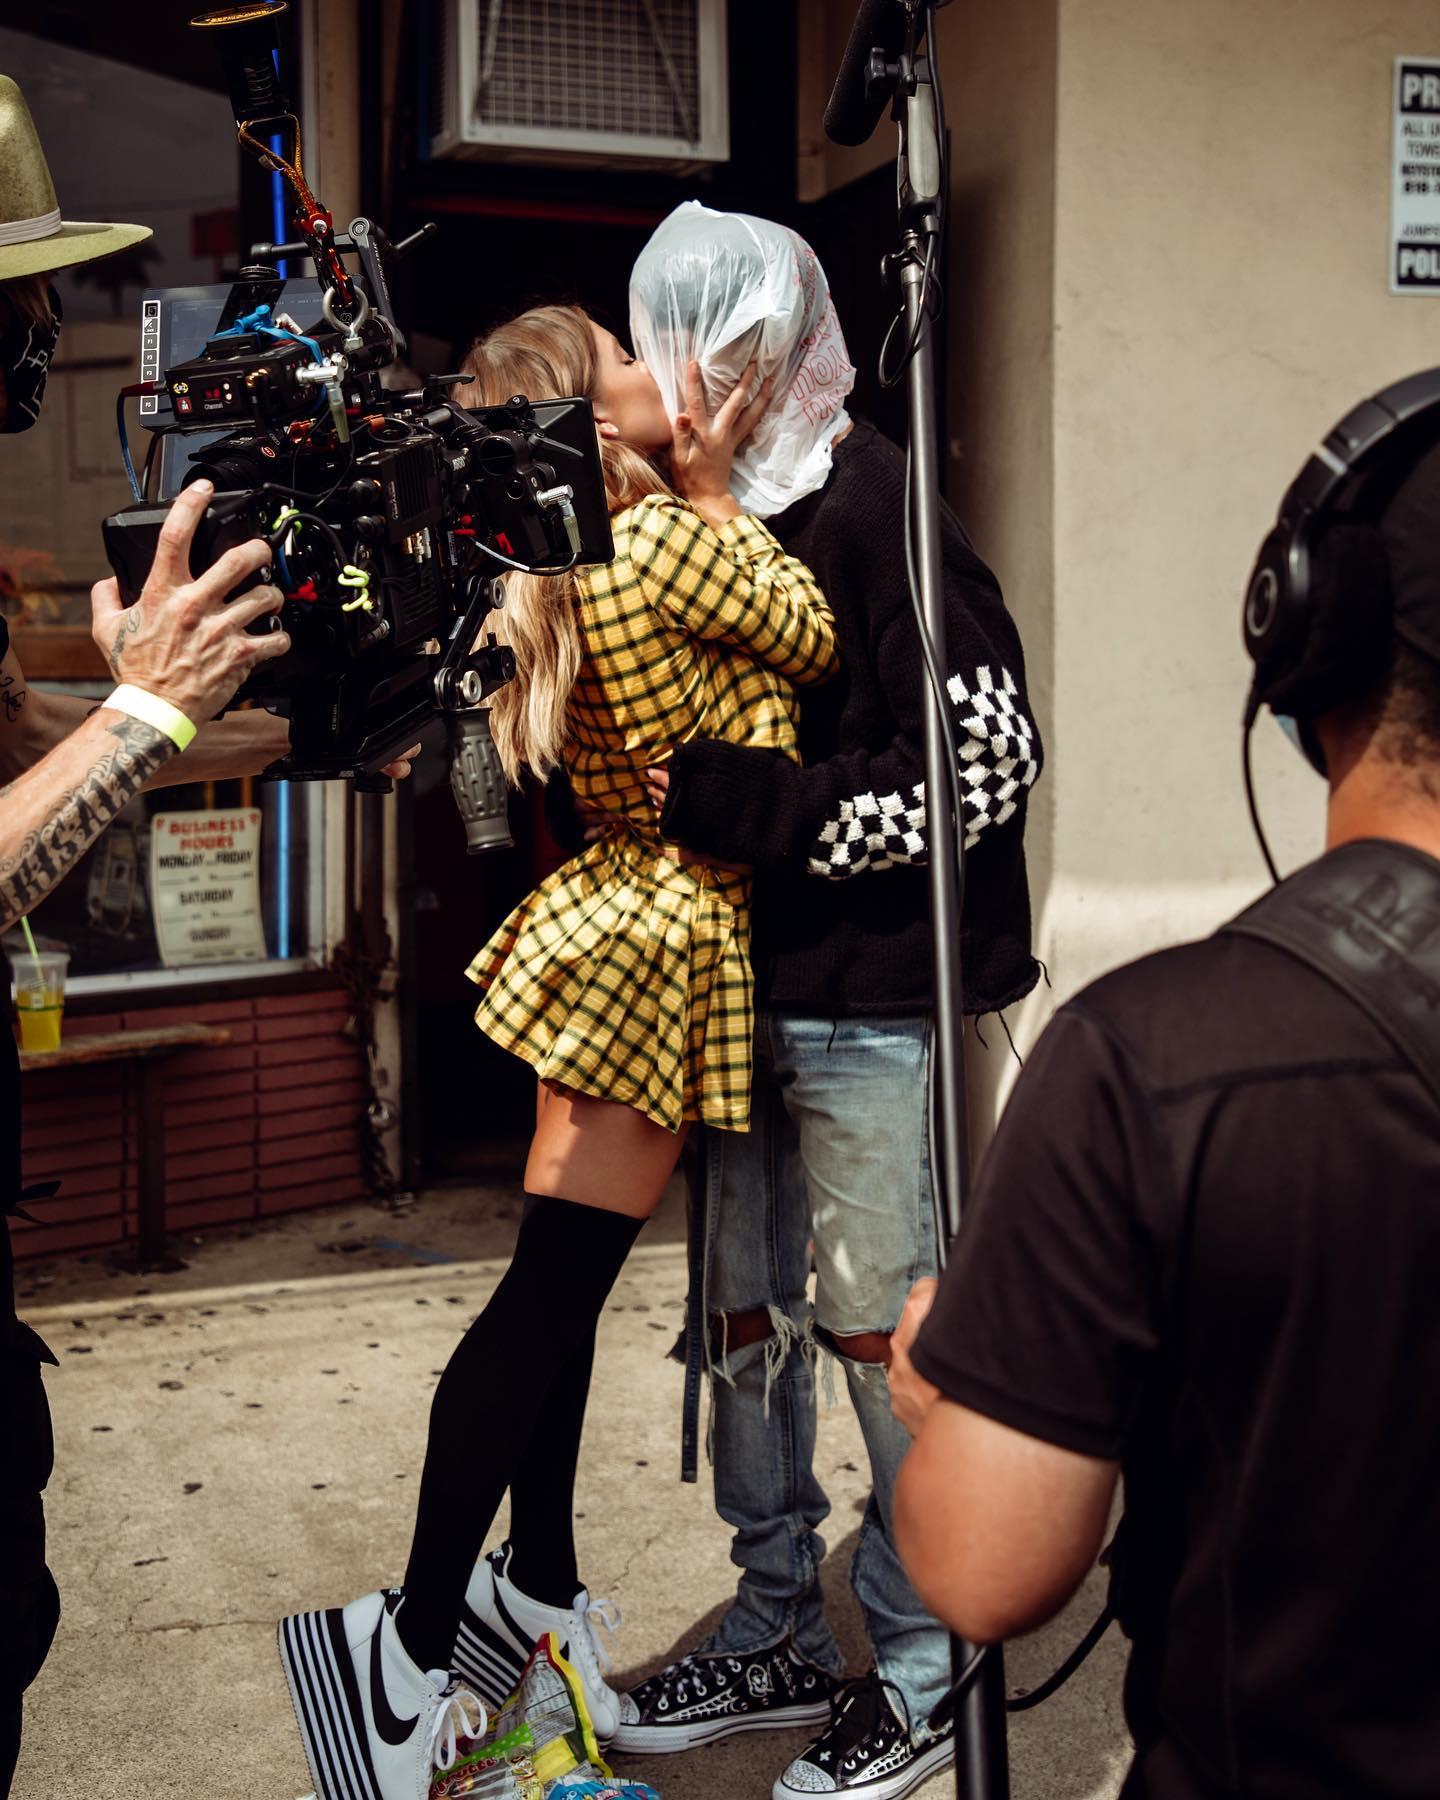 PHOTOS Sydney Sweeney étoiles dans un film de Kelly Mitrailleuse!